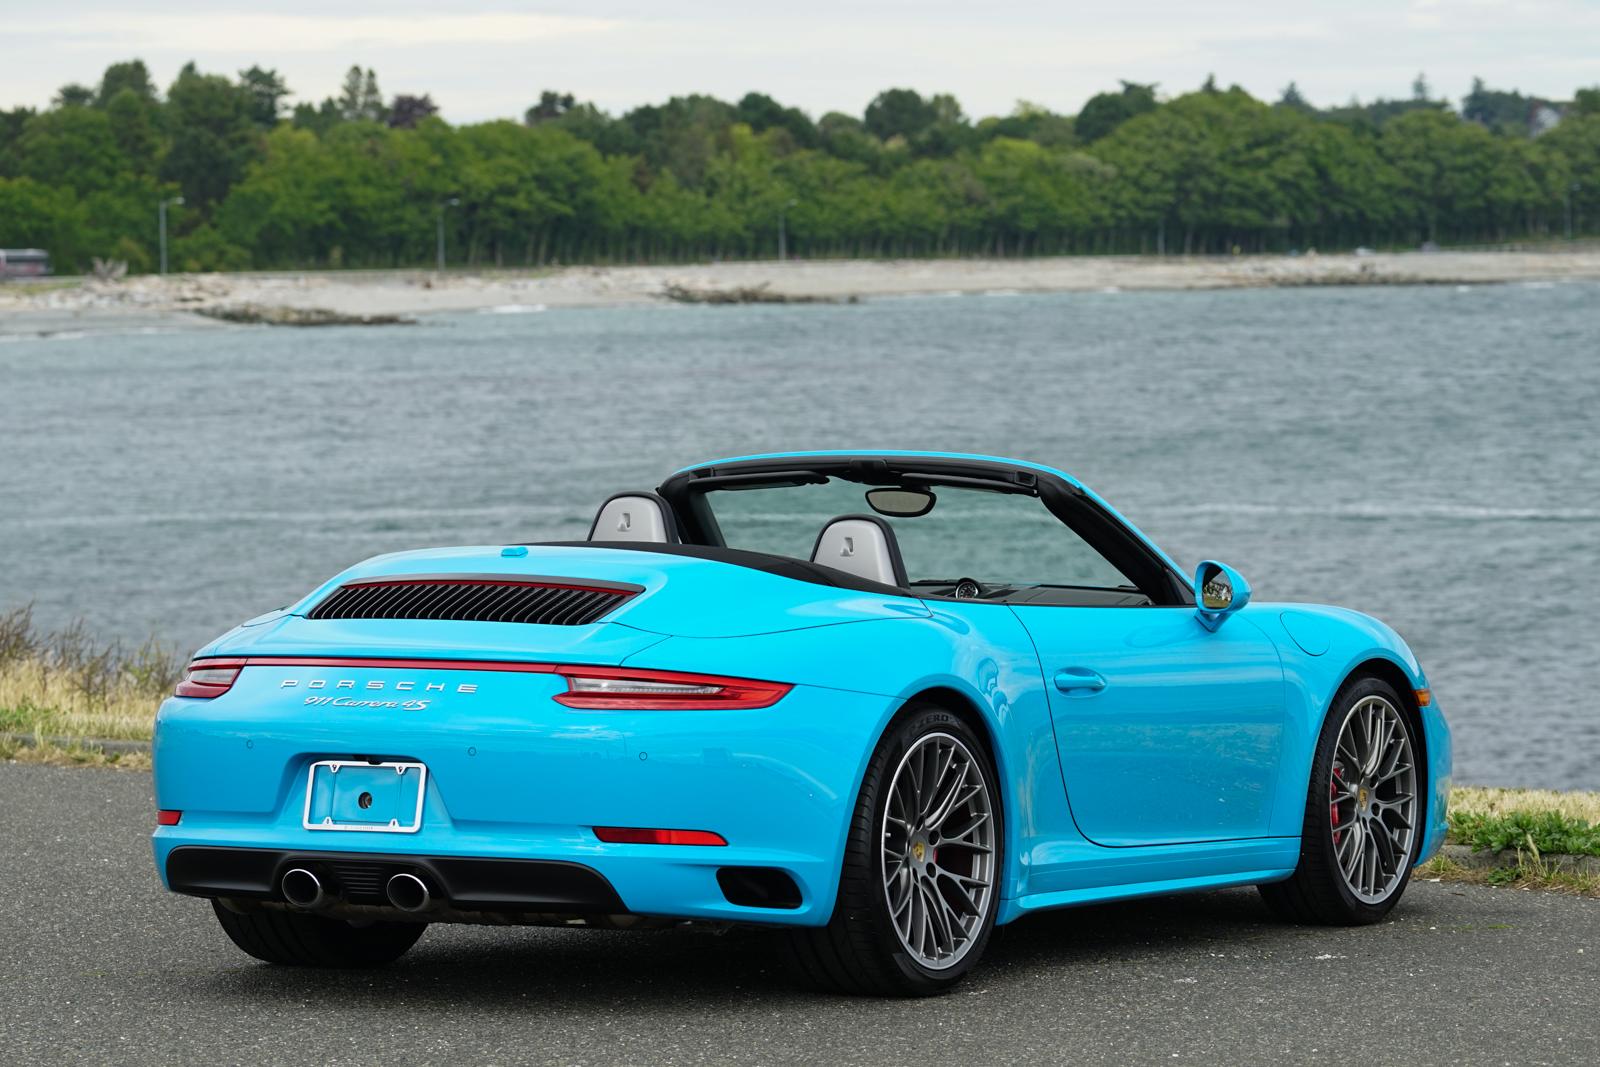 2017 porsche 911 carrera 4s cabriolet for sale silver arrow cars ltd. Black Bedroom Furniture Sets. Home Design Ideas